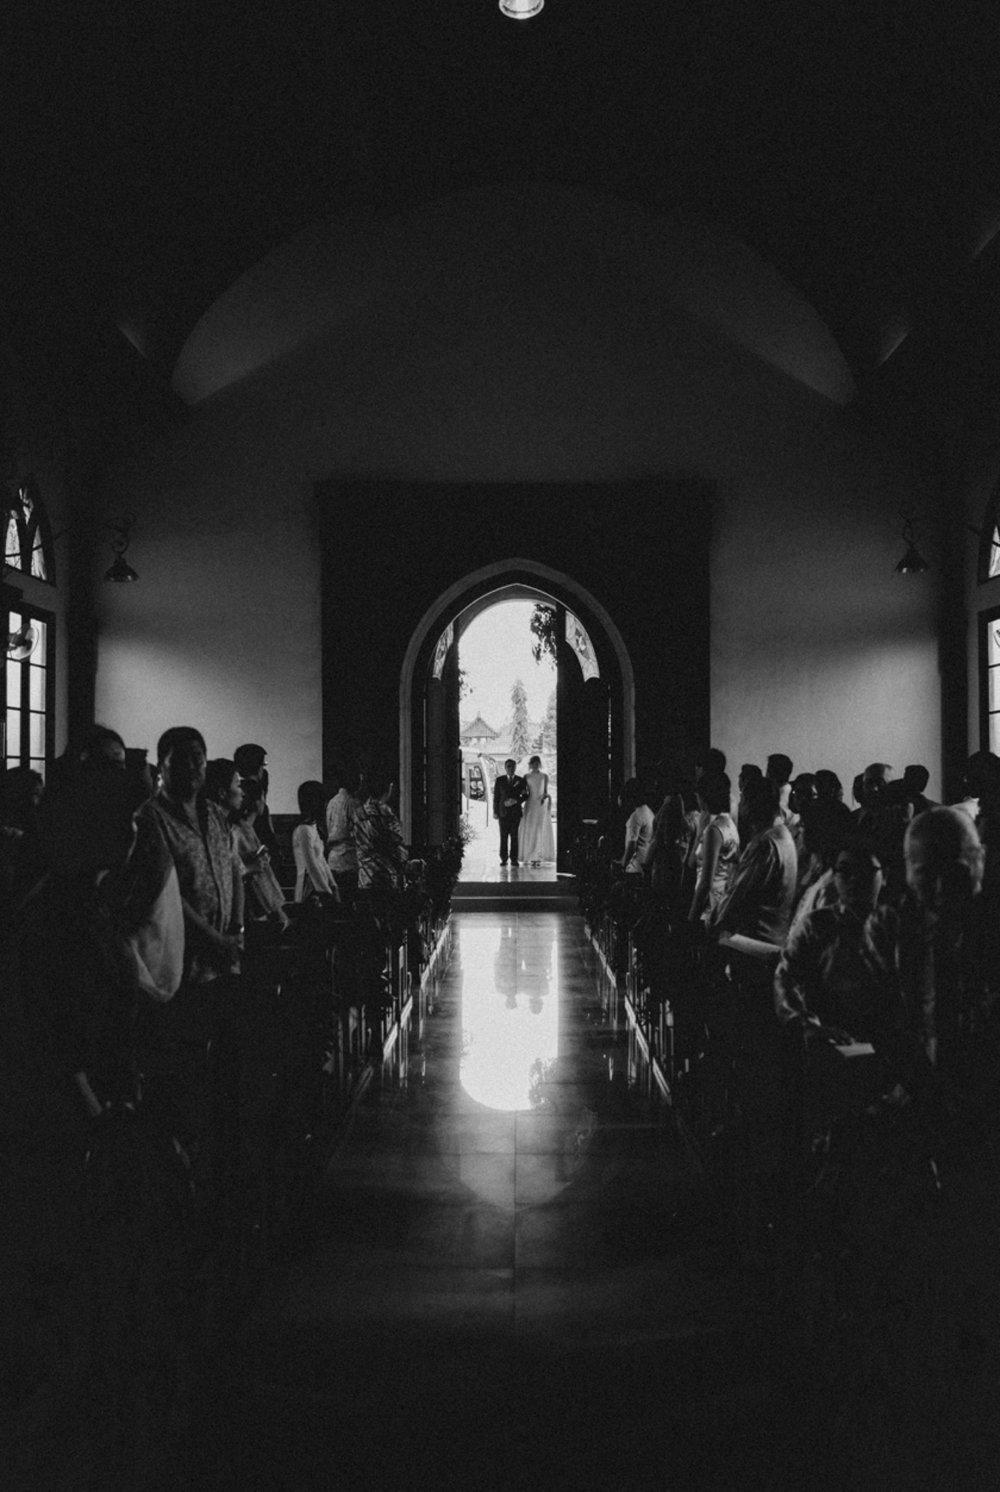 Tim-Danika-Bali-Wedding-Pyara-Photo-Evans 24.jpg